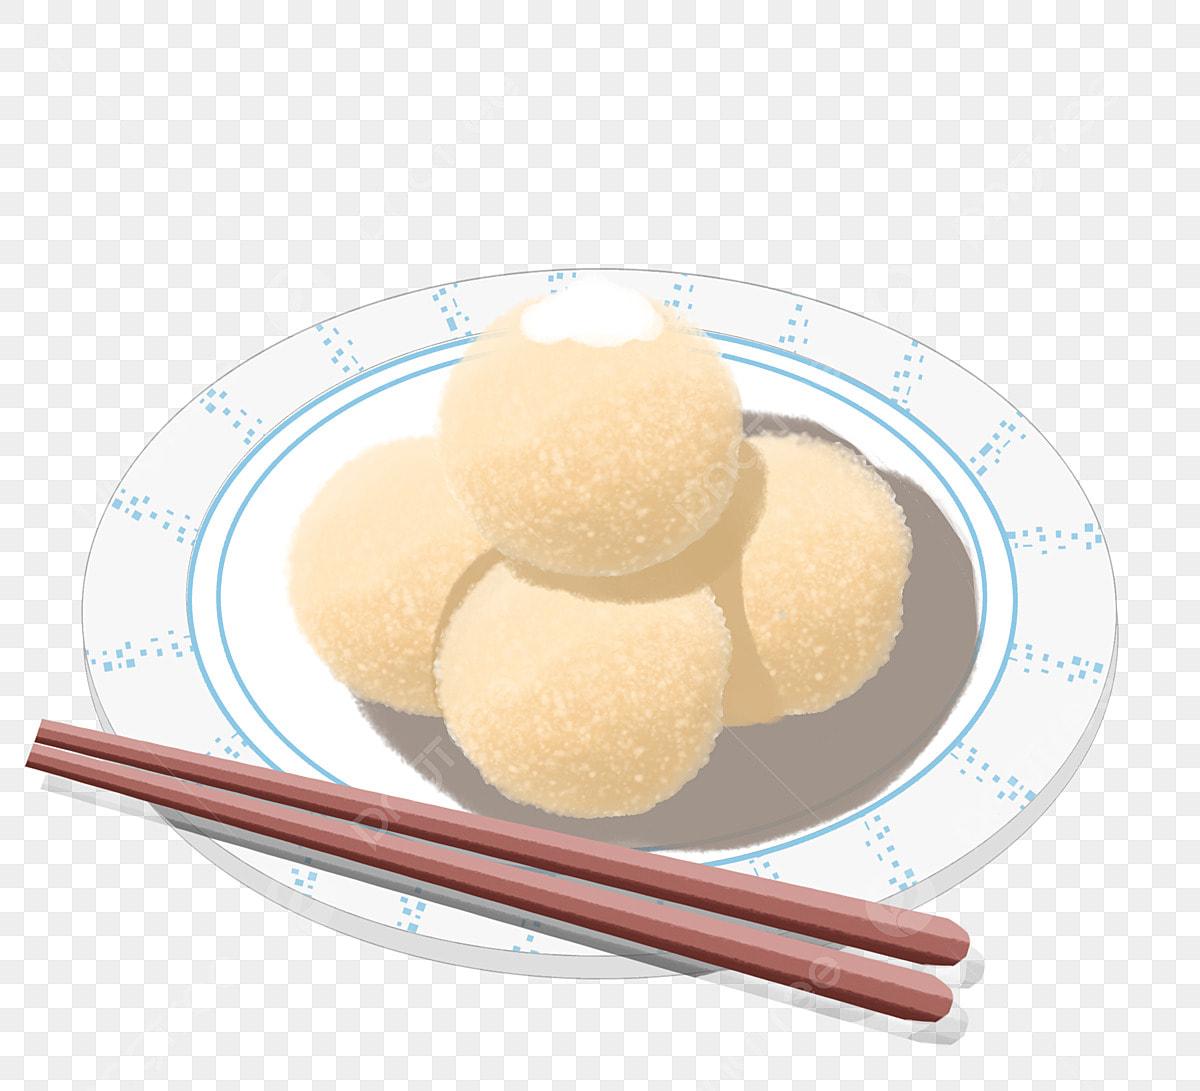 Ladu Goreng Ilustrasi Makanan Kartun Bola Nasi Makanan Ringan